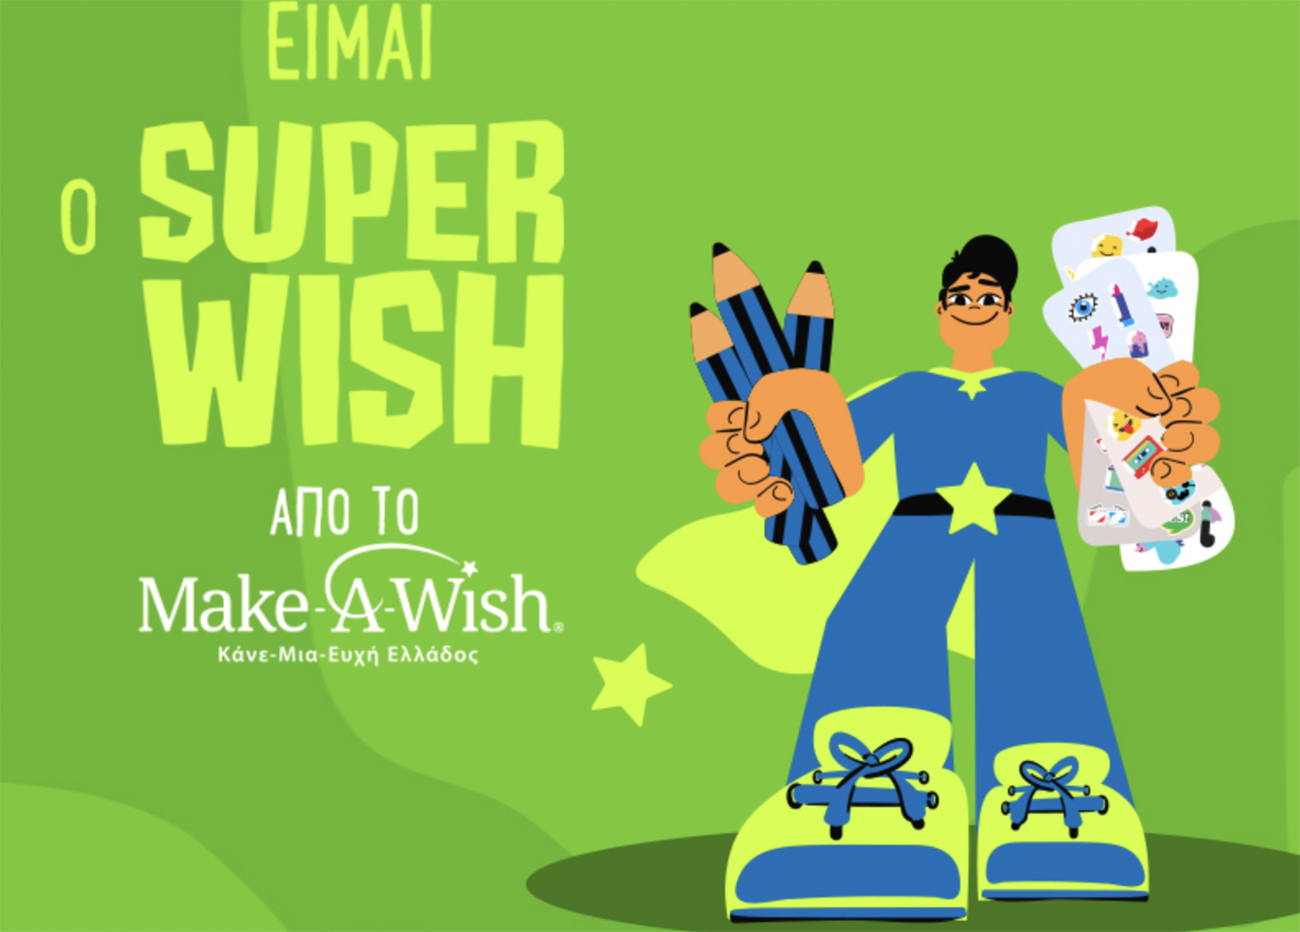 e-fresh.gr & Make-A-Wish συνεργάζονται για την ευχή του 7χρονου Δημήτρη